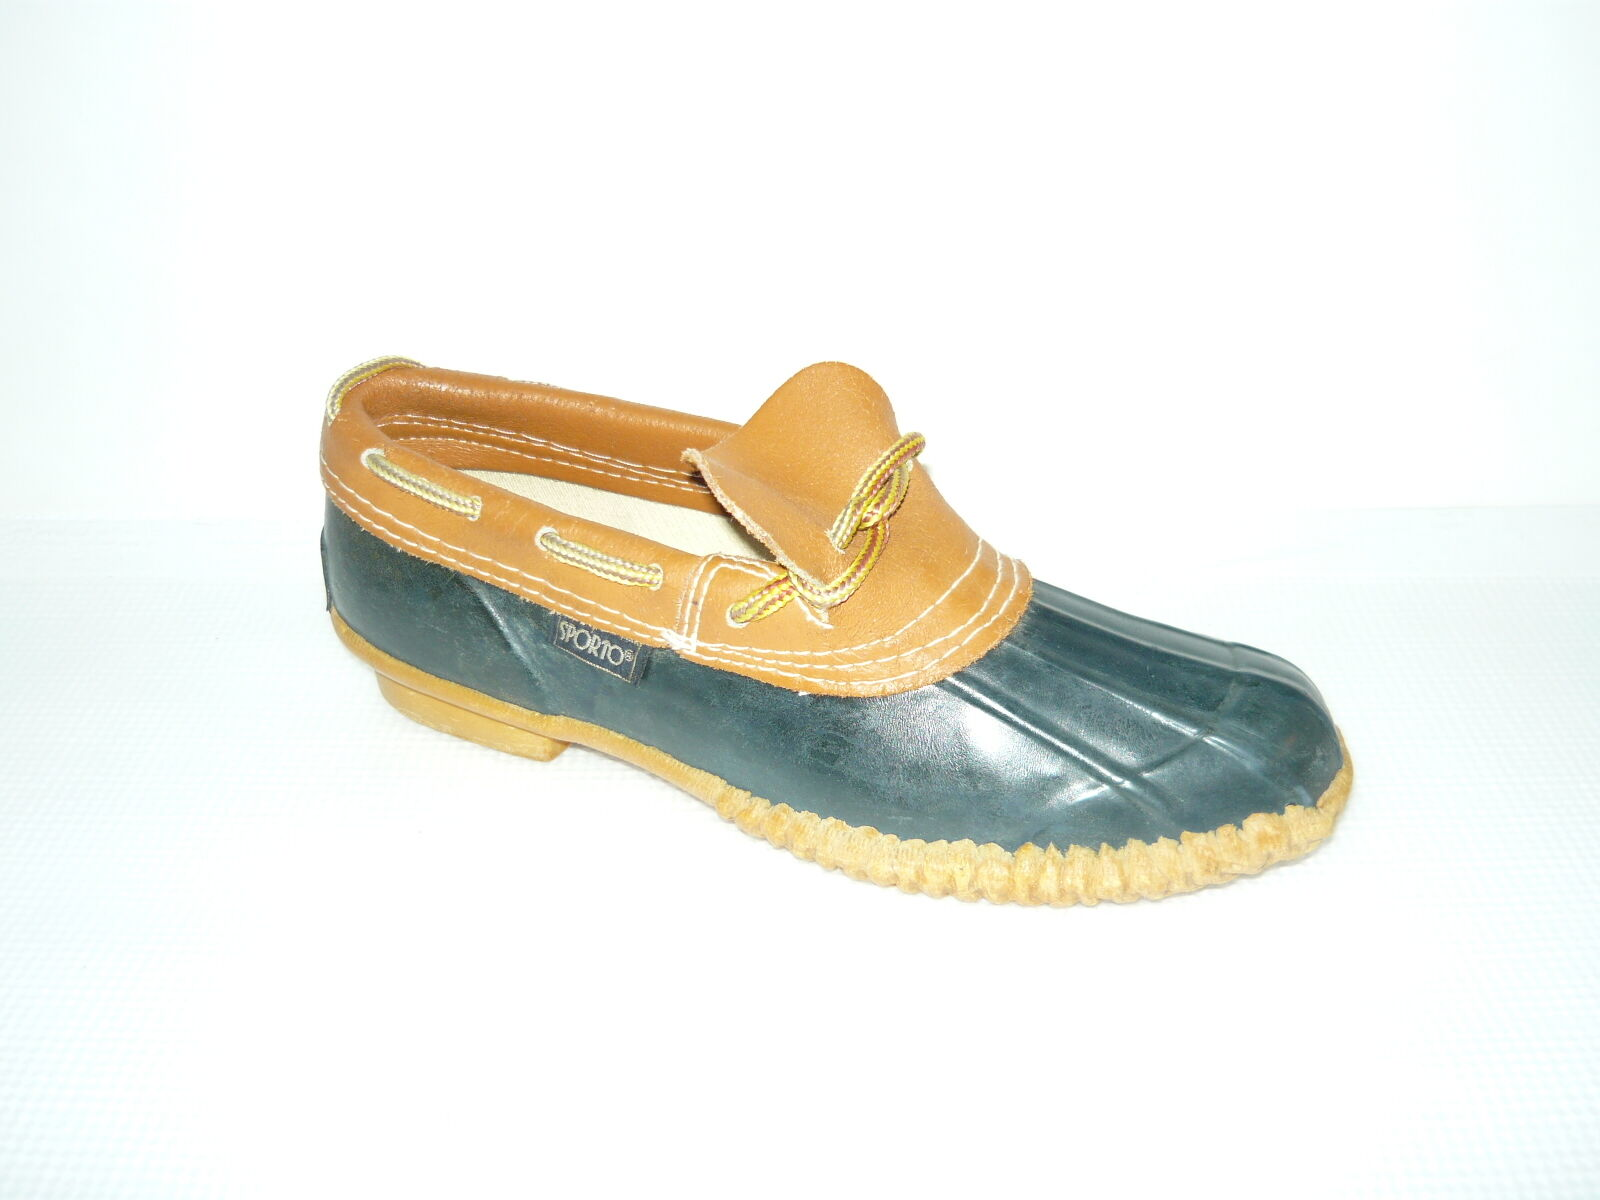 VTG Sporto Original Rain Snow Duck Boots bluee Brown Leather Rubber Women Size 7